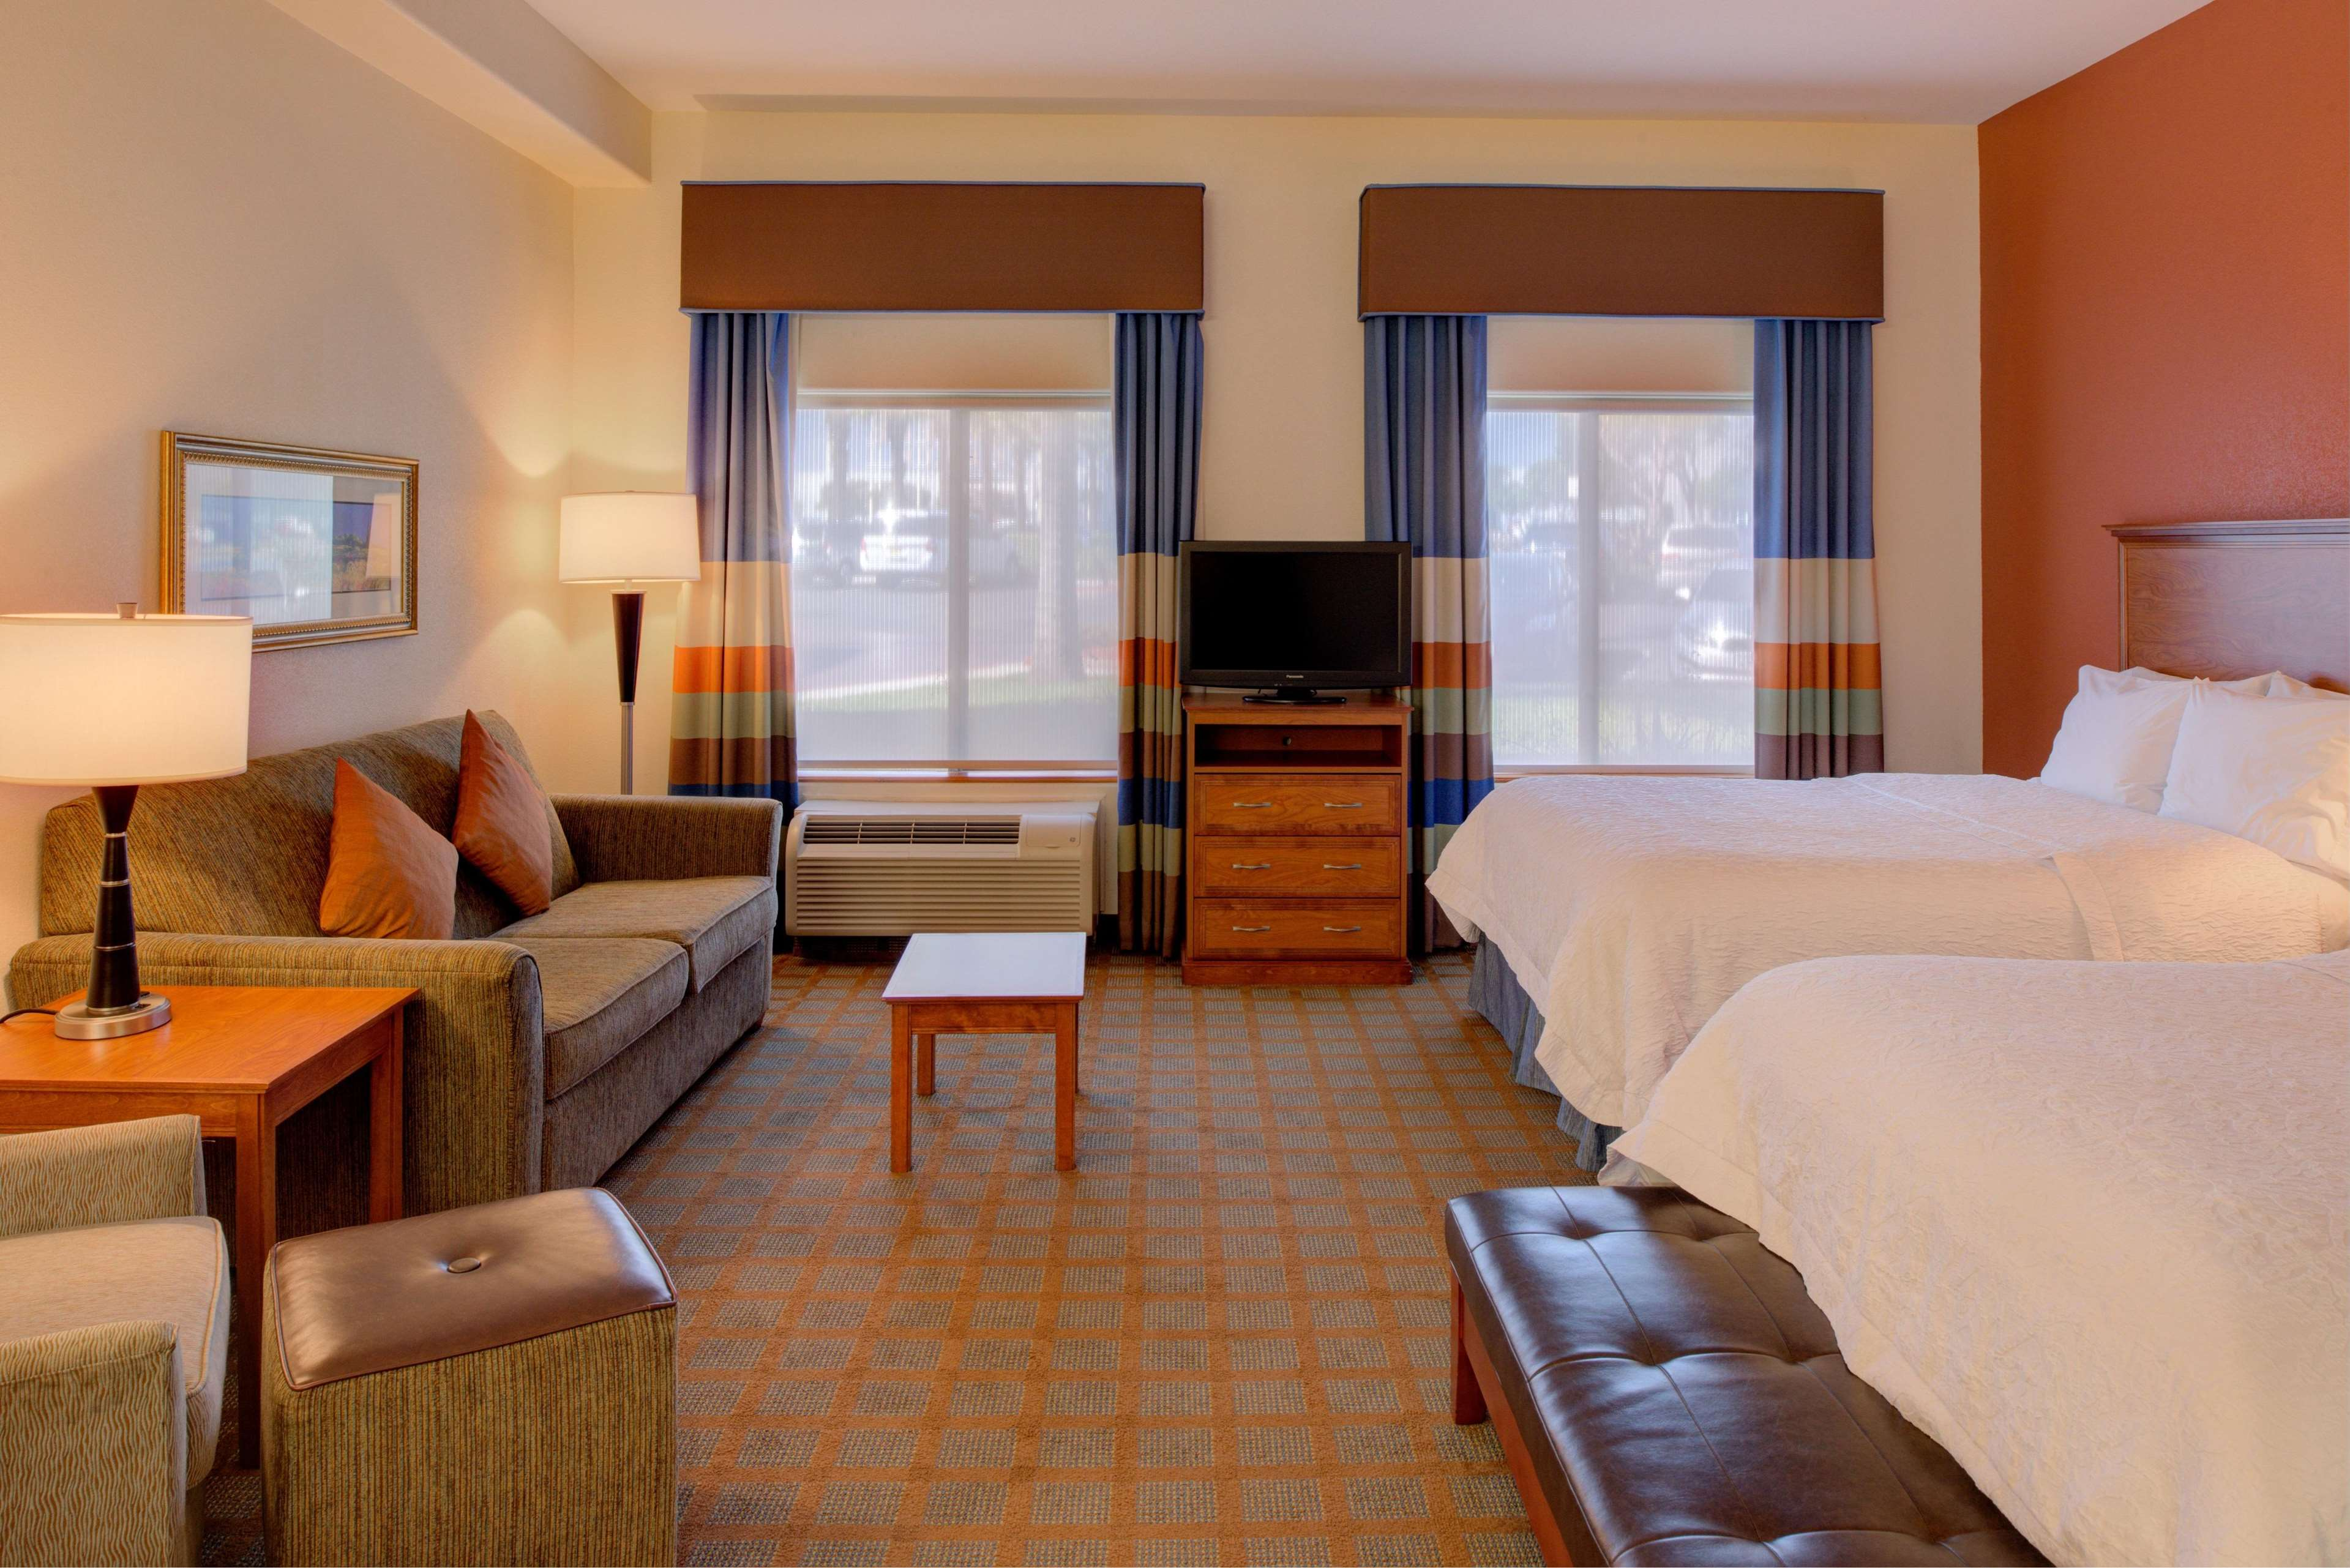 Bed Breakfast Ontario Inn Lodging Directory